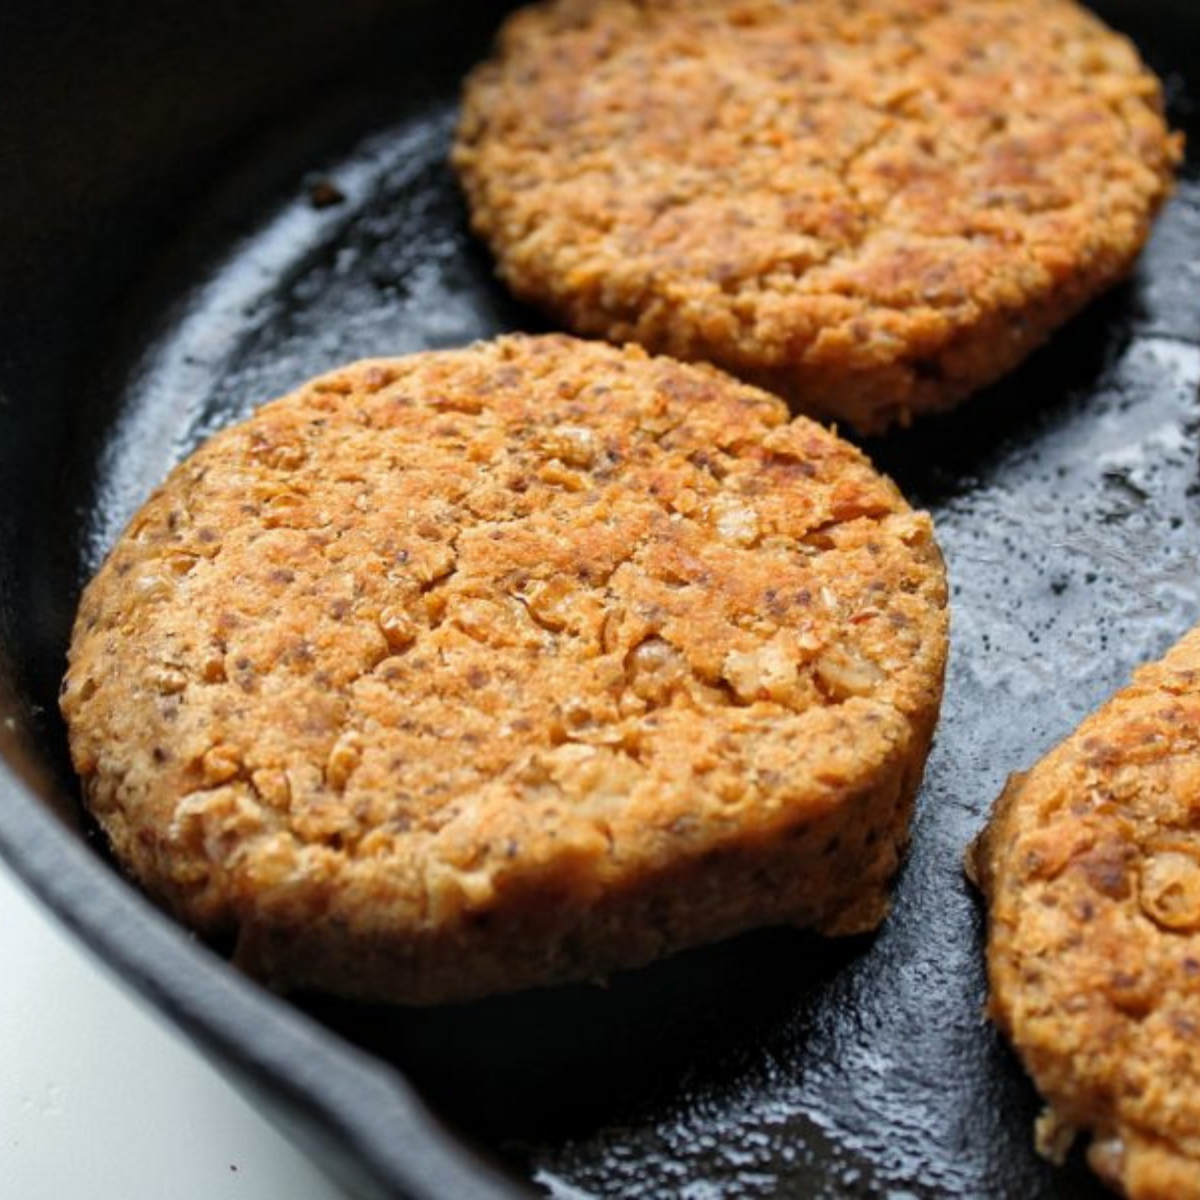 Cannellini bean veggie burger in cast-iron skillet